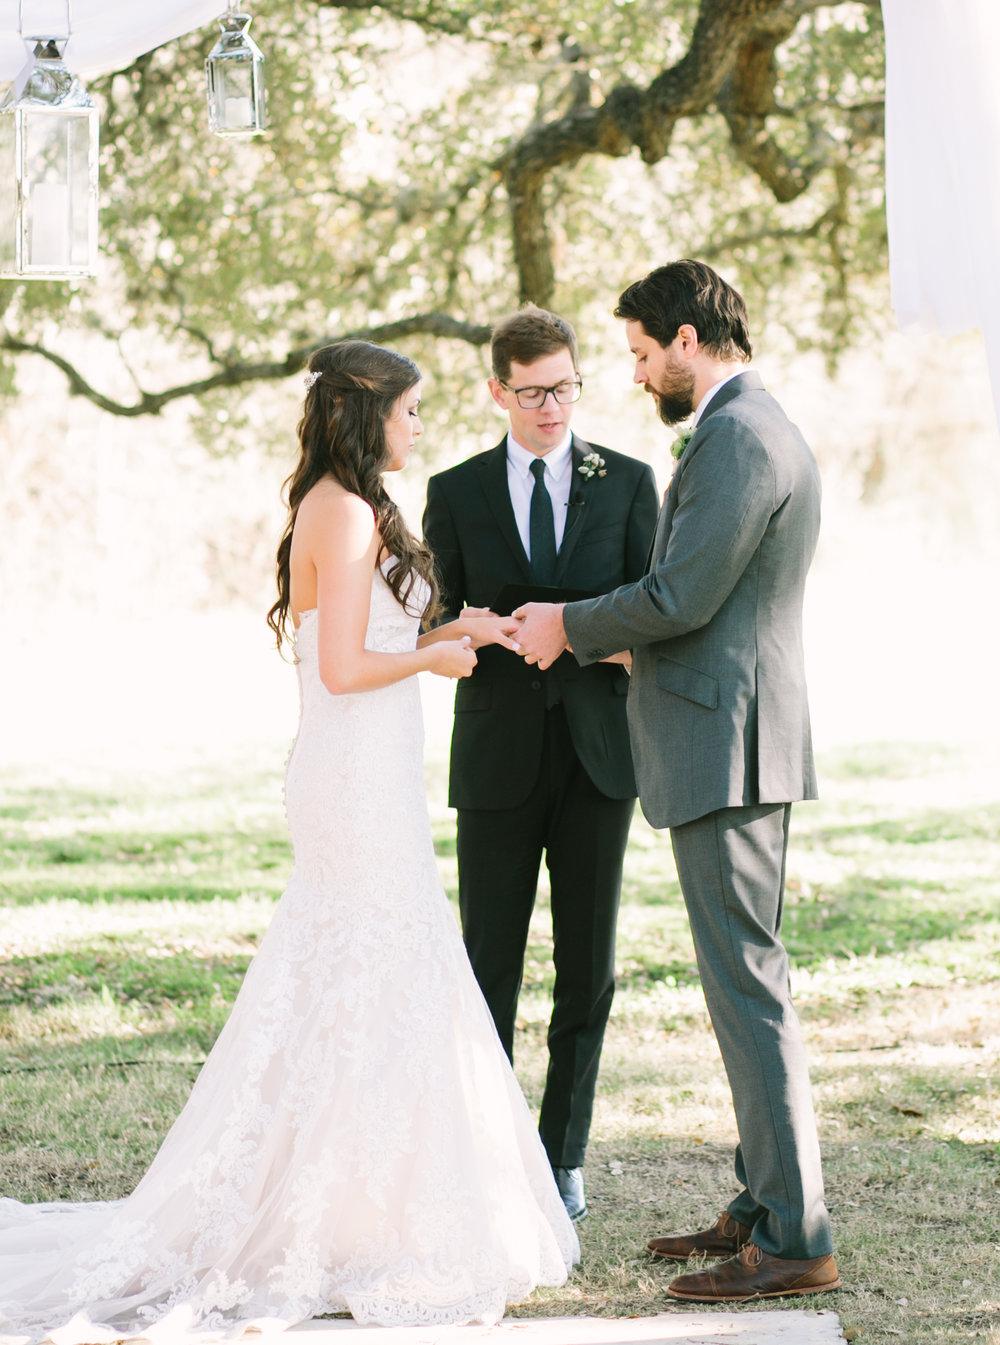 Central Texas Wedding   Vineyards at Chappel Lodge   Fine Art   Emilie Anne Photography-6.jpg